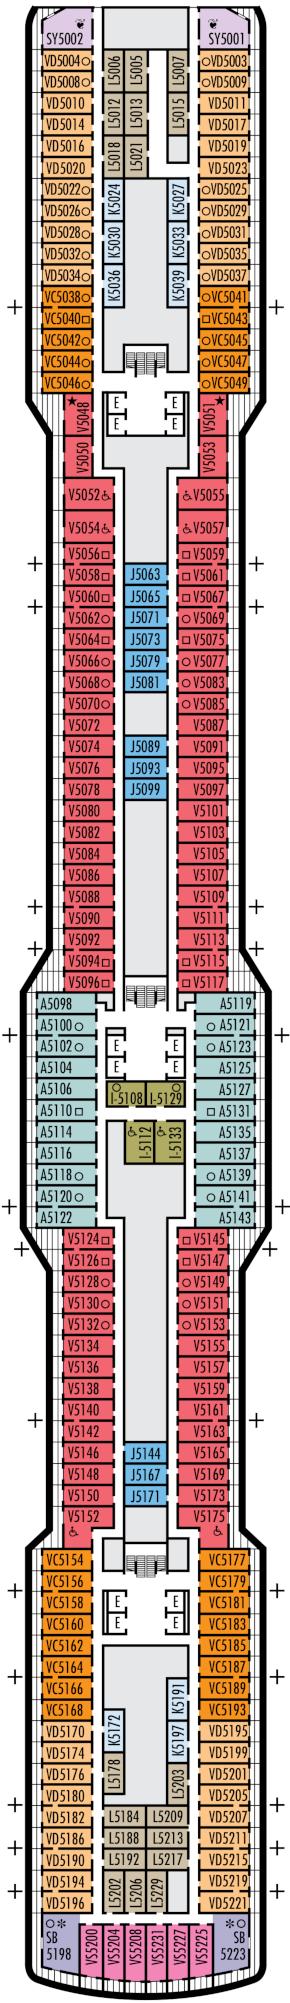 Nieuw Statendam Gershwin Deck Deck Plan